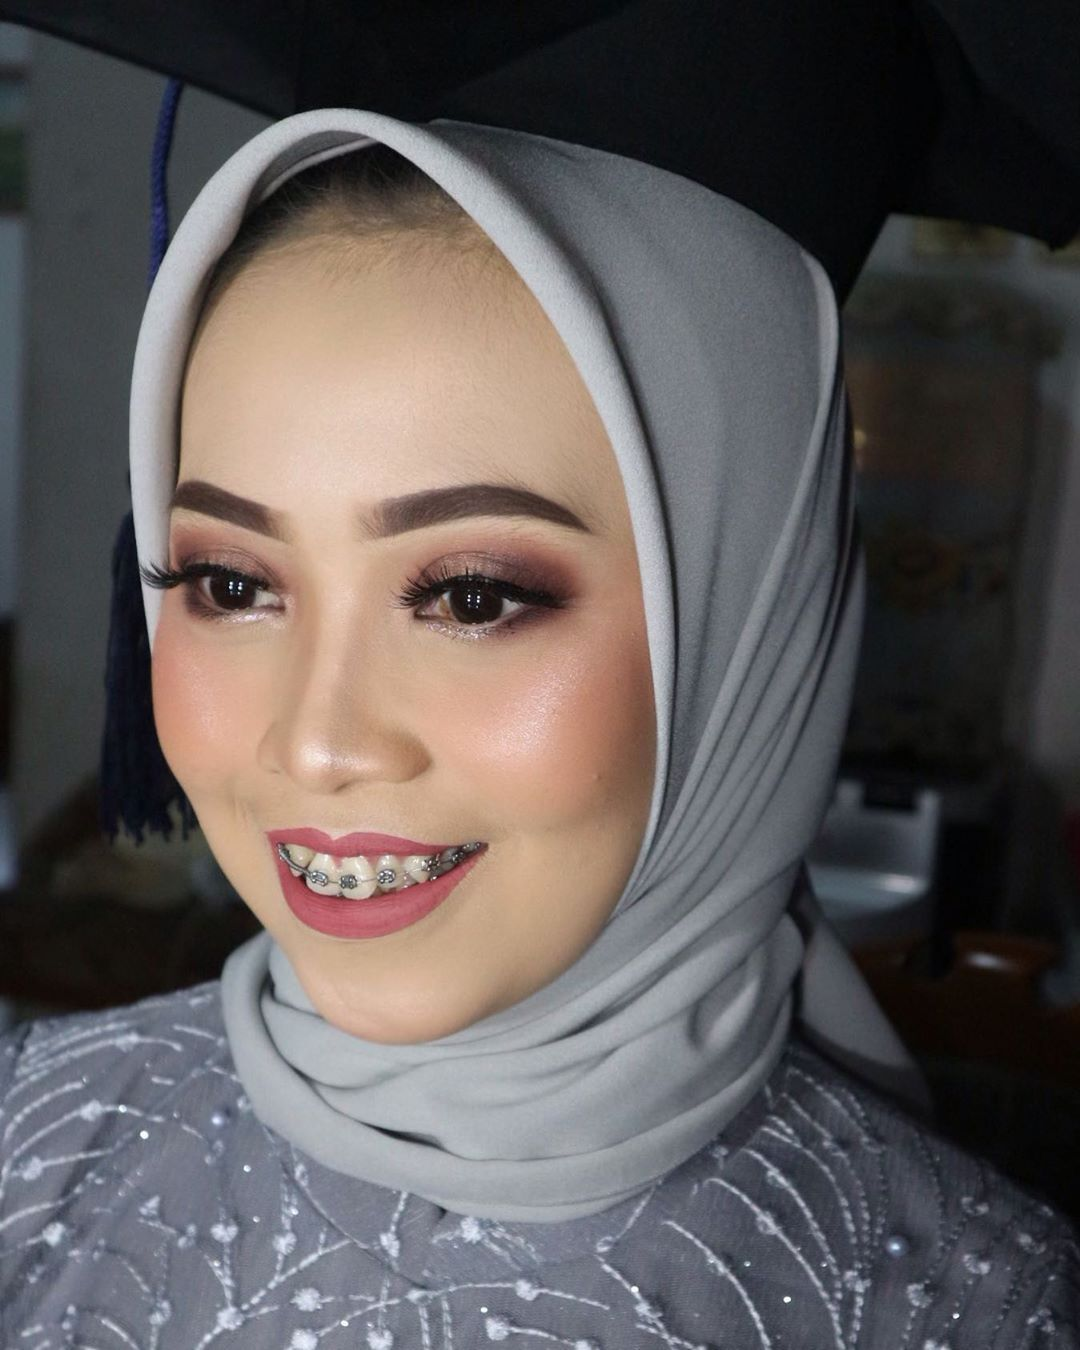 Latepost Wisuda Poltekes Bandung Info Price List 082120102919 Nbsp Nbsp Makeupbyninda Nbsp Nbsp Bold Makeup Looks Bold Makeup Wedding Makeup